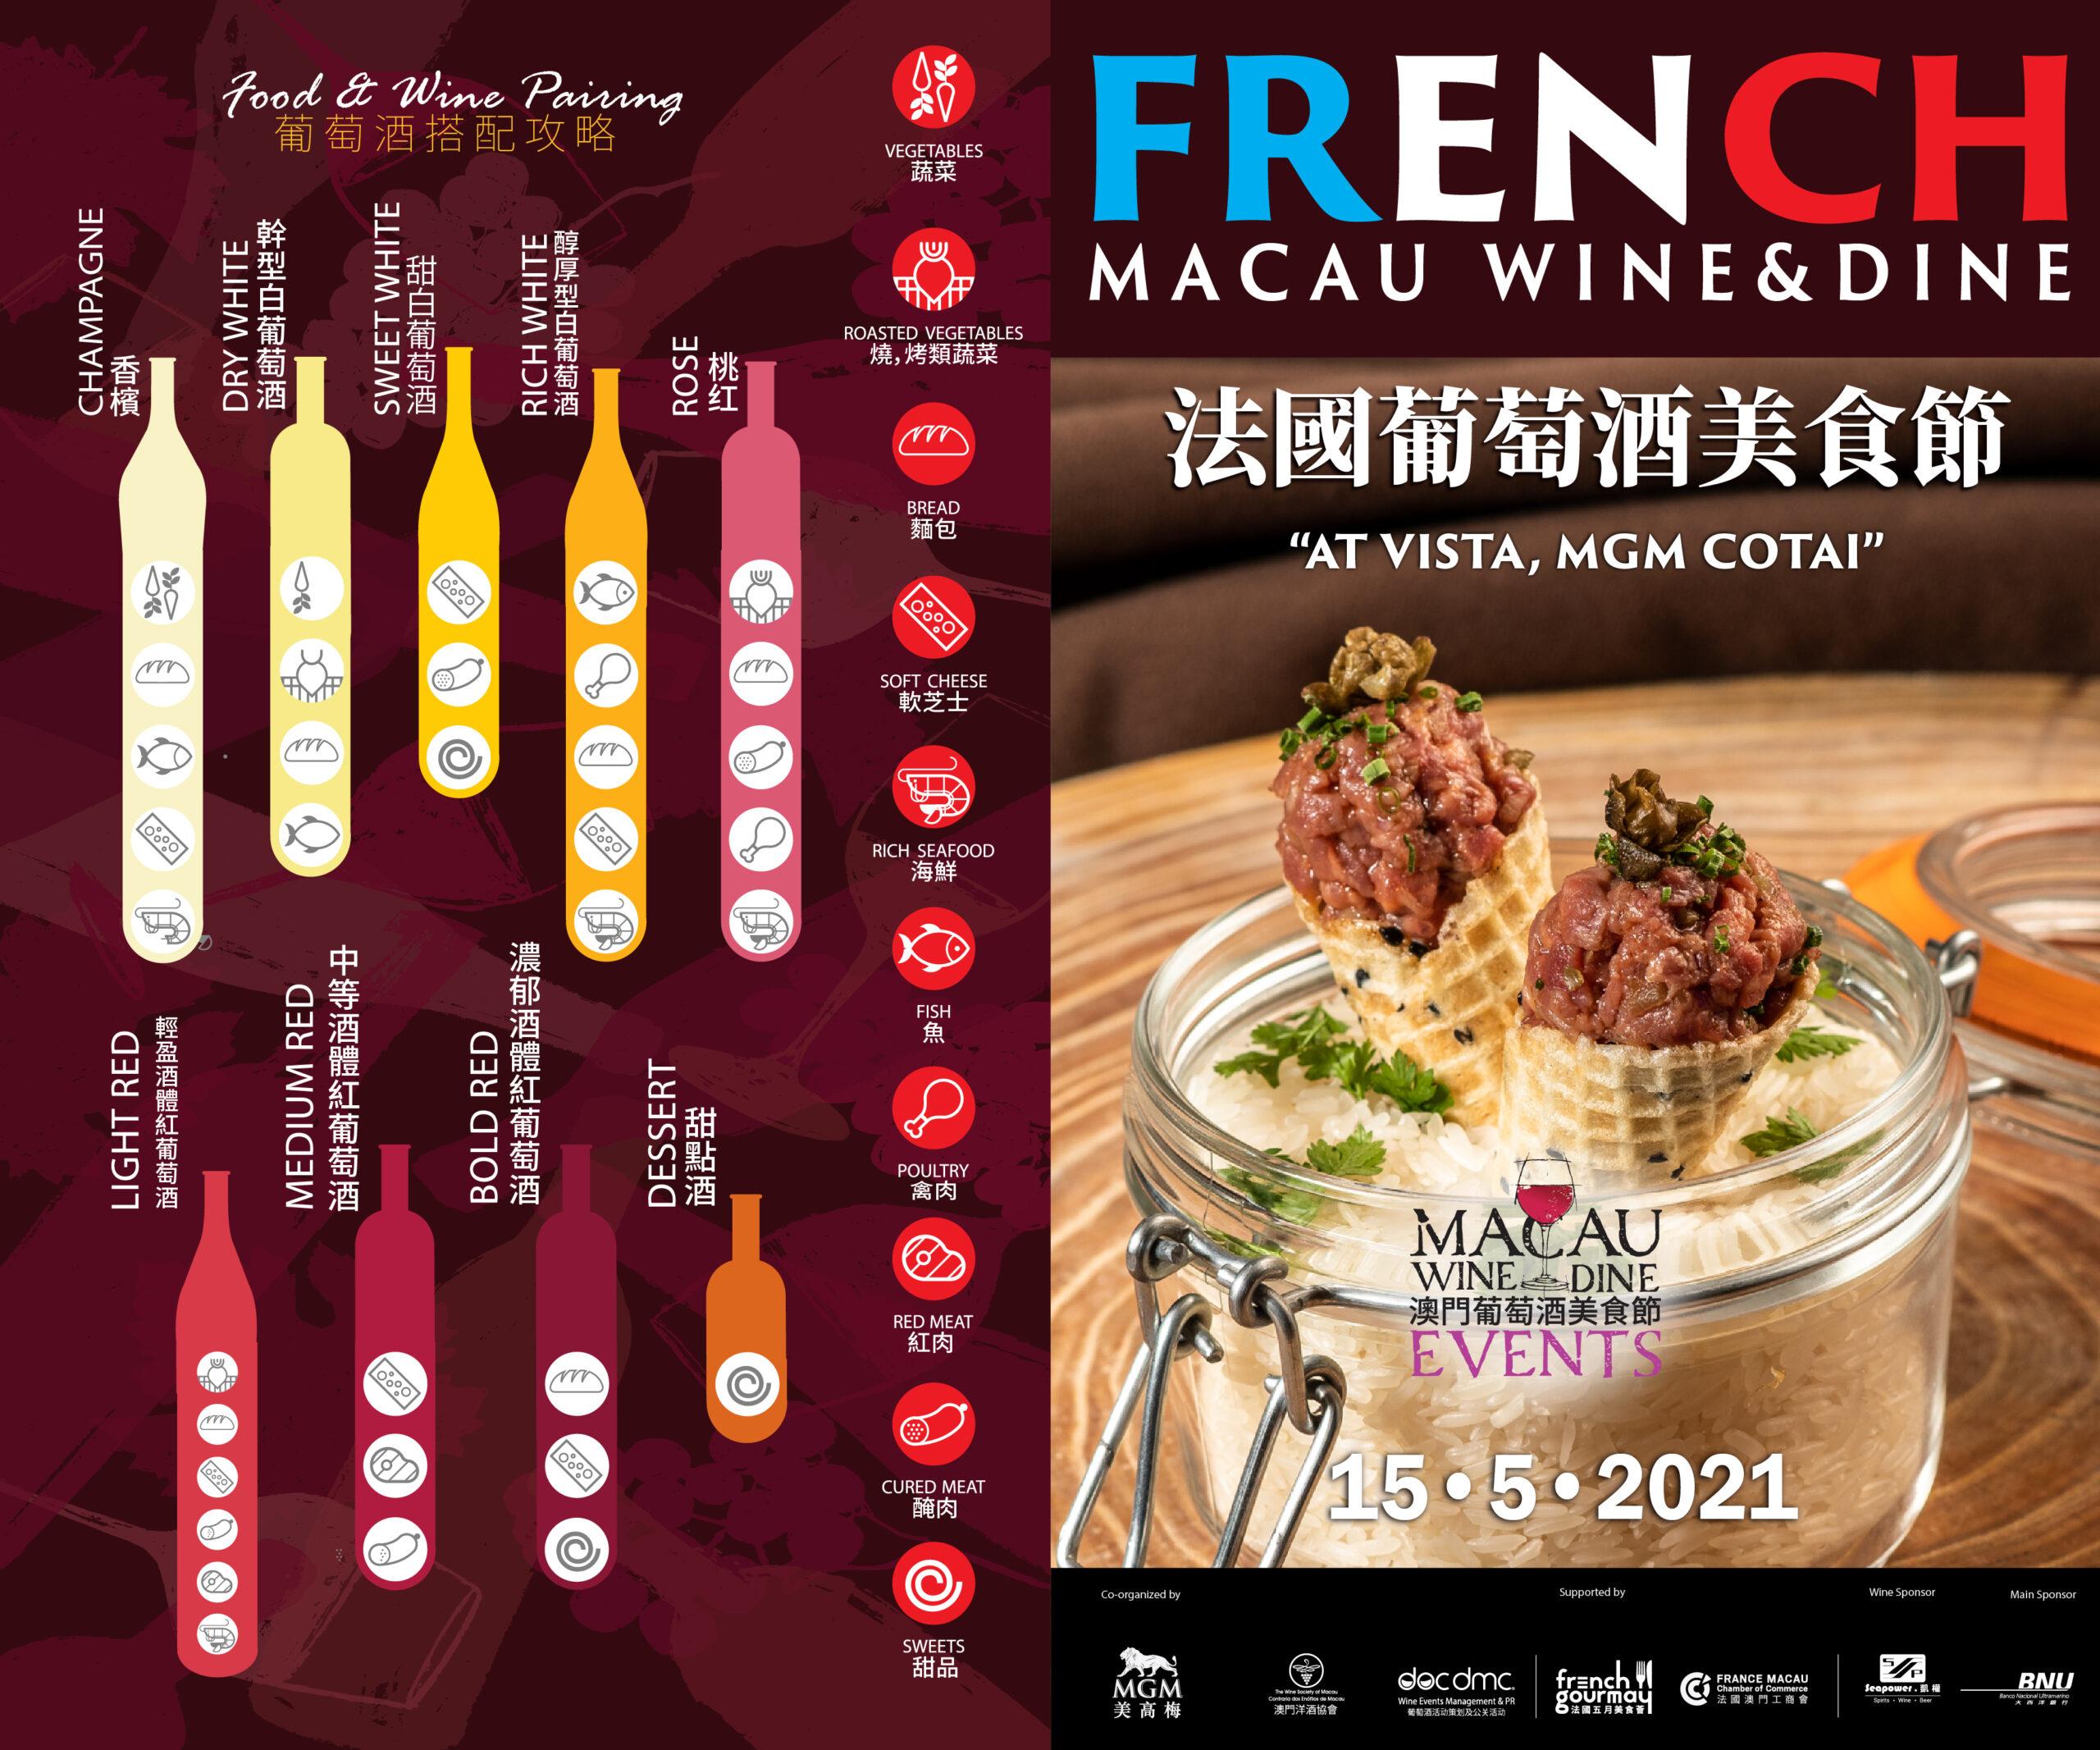 French Wine & Dine 2021, macau wine & dine events